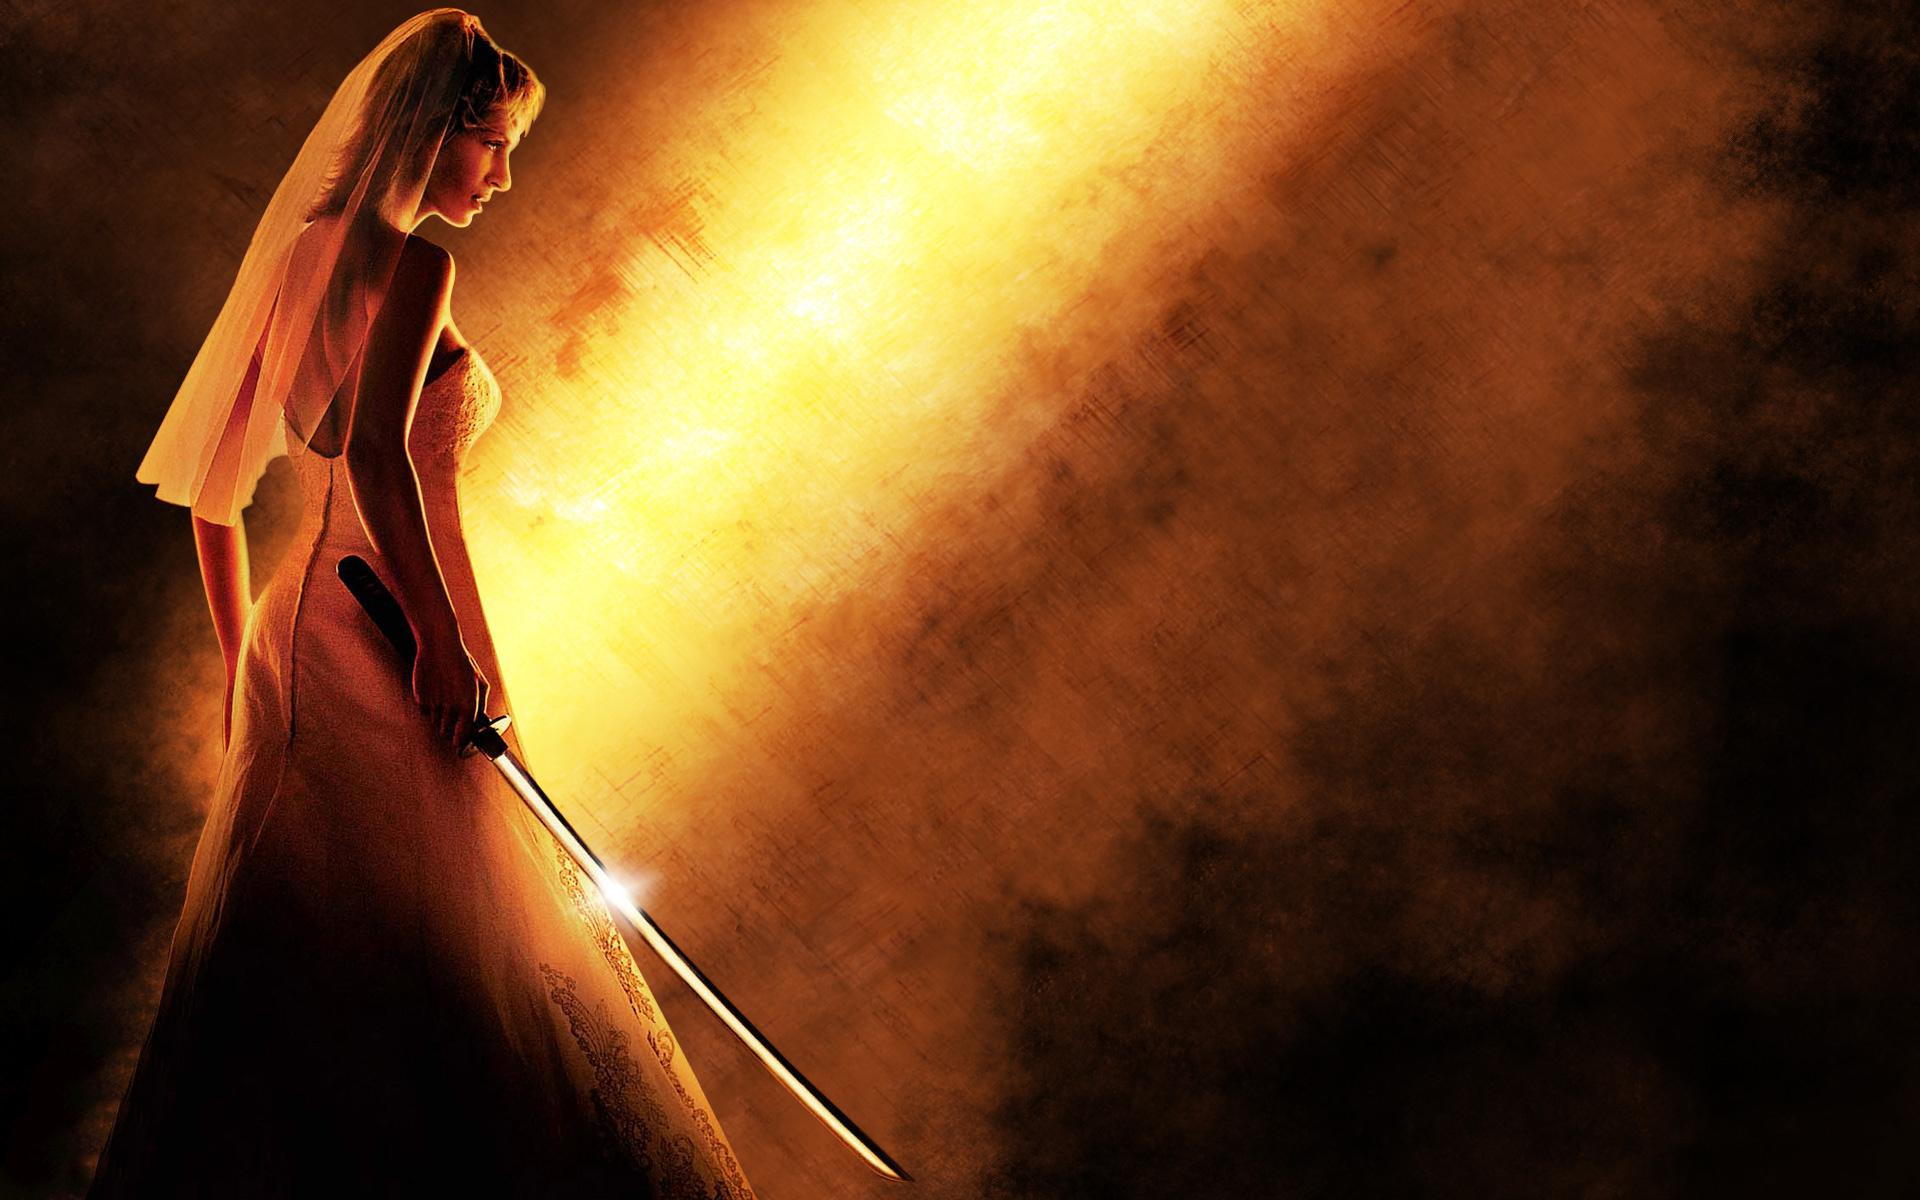 Katana Wallpaper Hd 9 Fantastic Hd Kill Bill Movie Wallpapers Hdwallsource Com